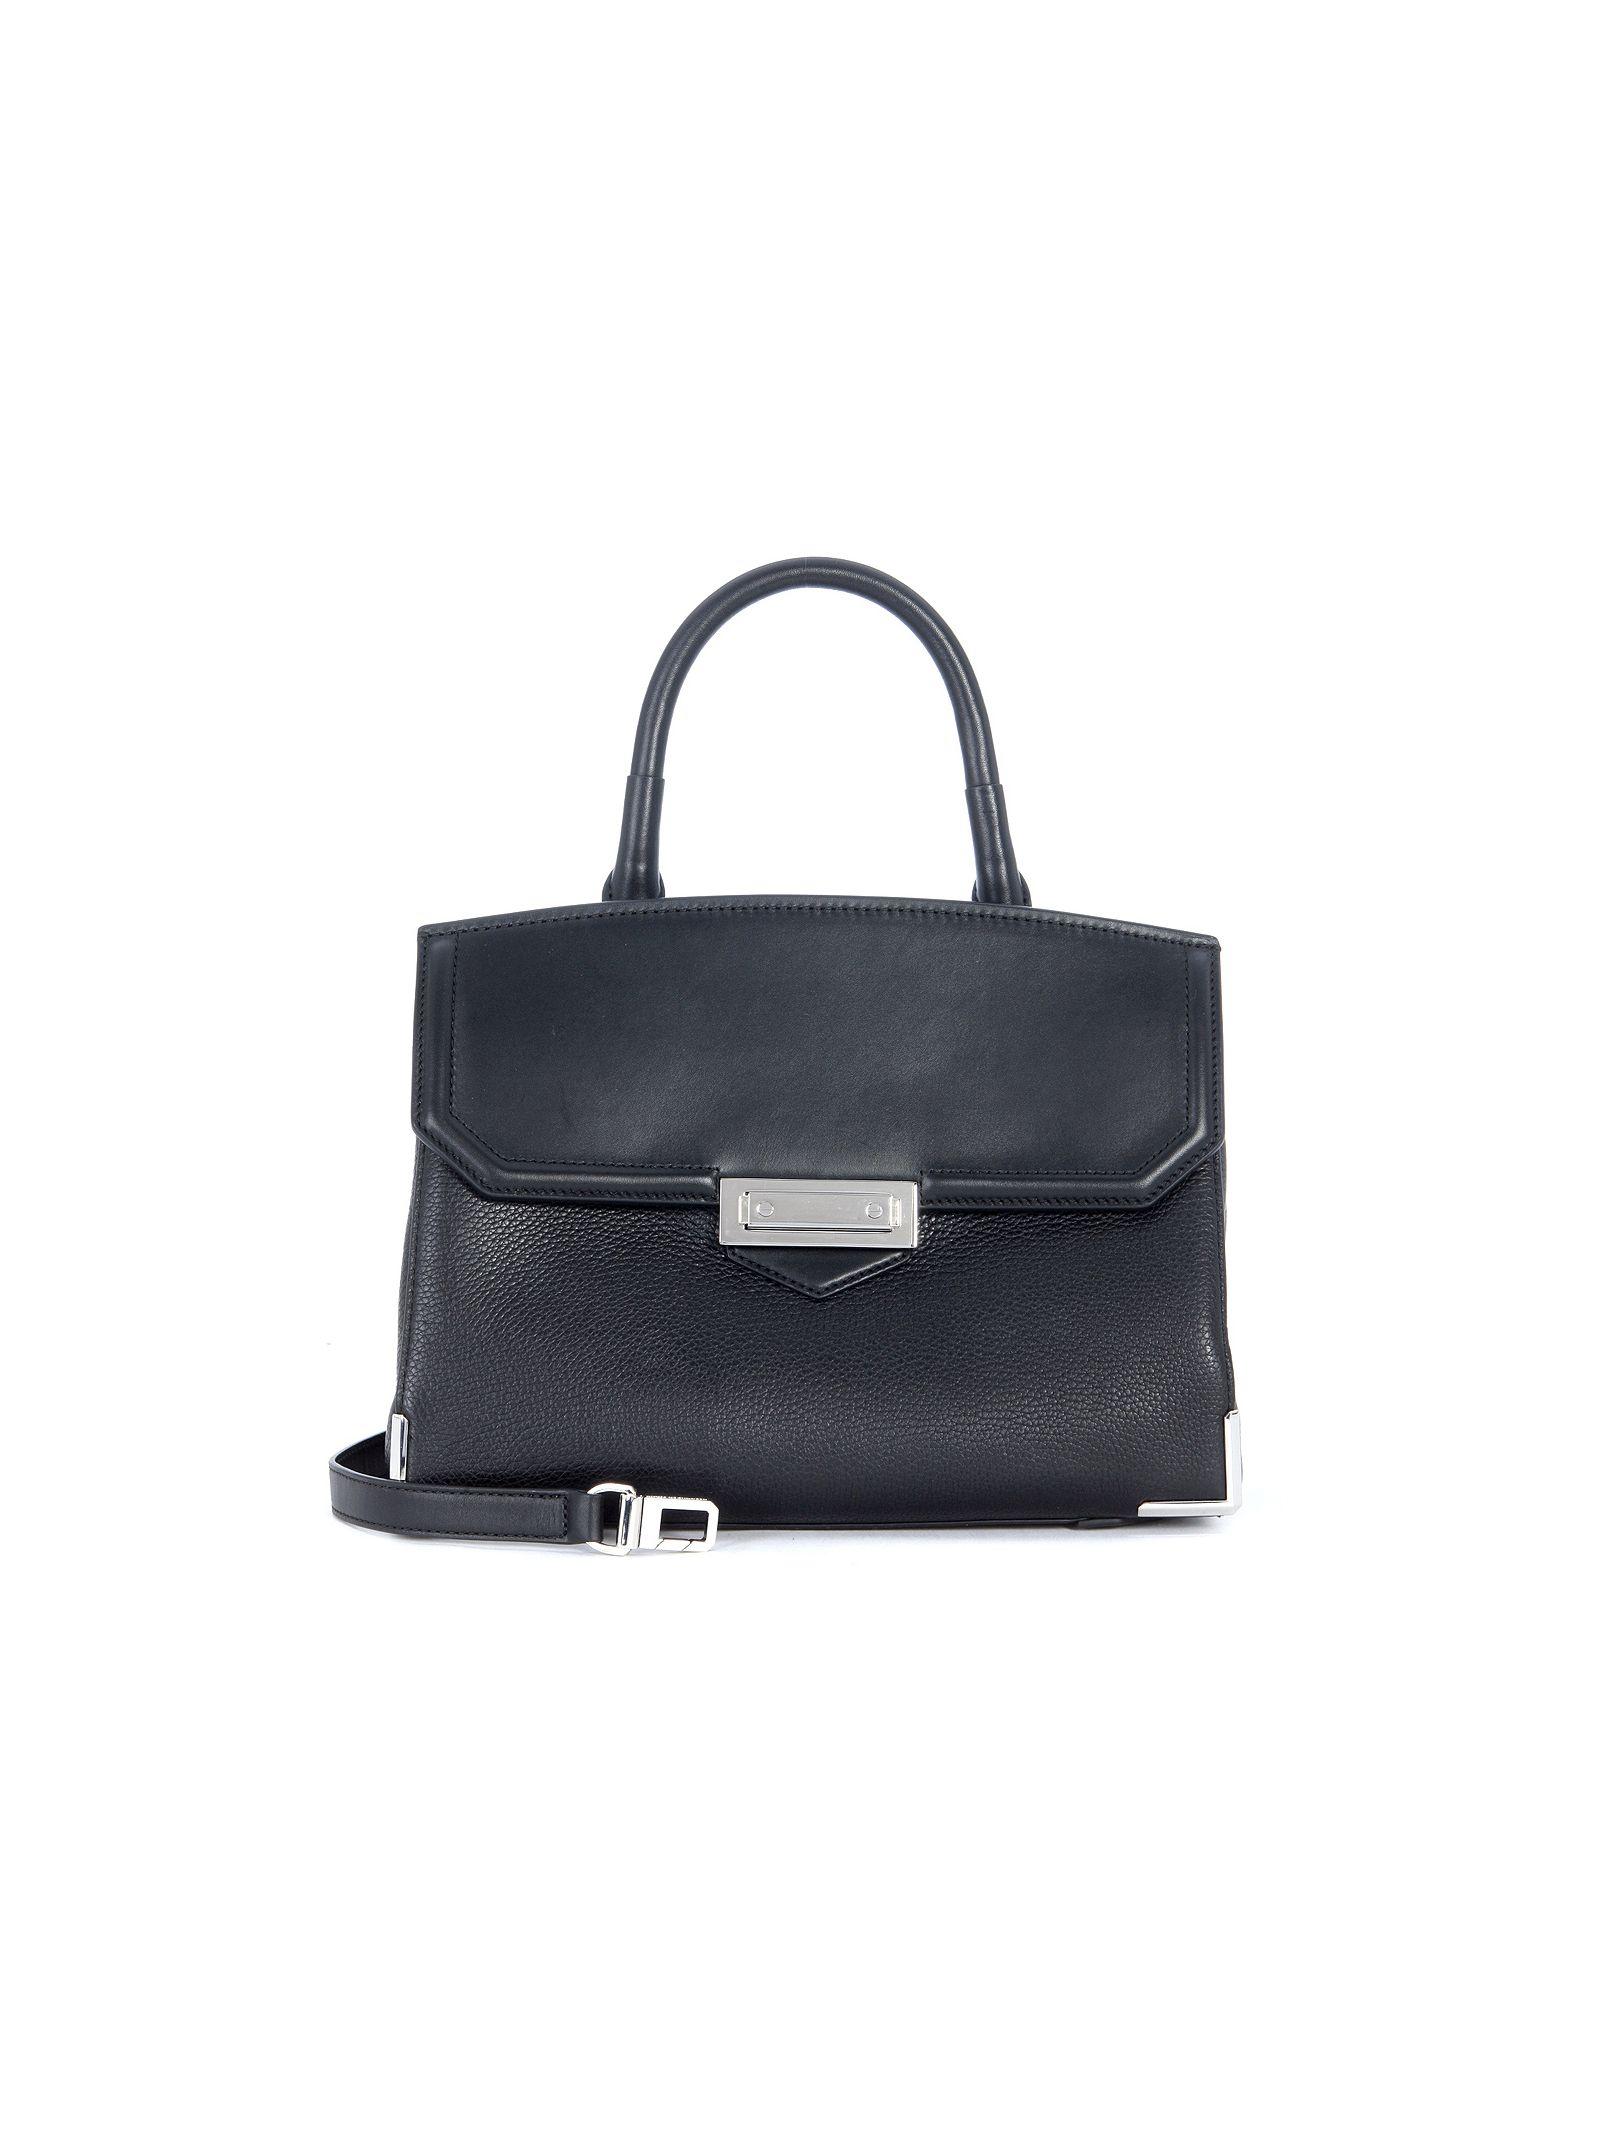 Alexander Wang Marion Large Black Leather Handbag